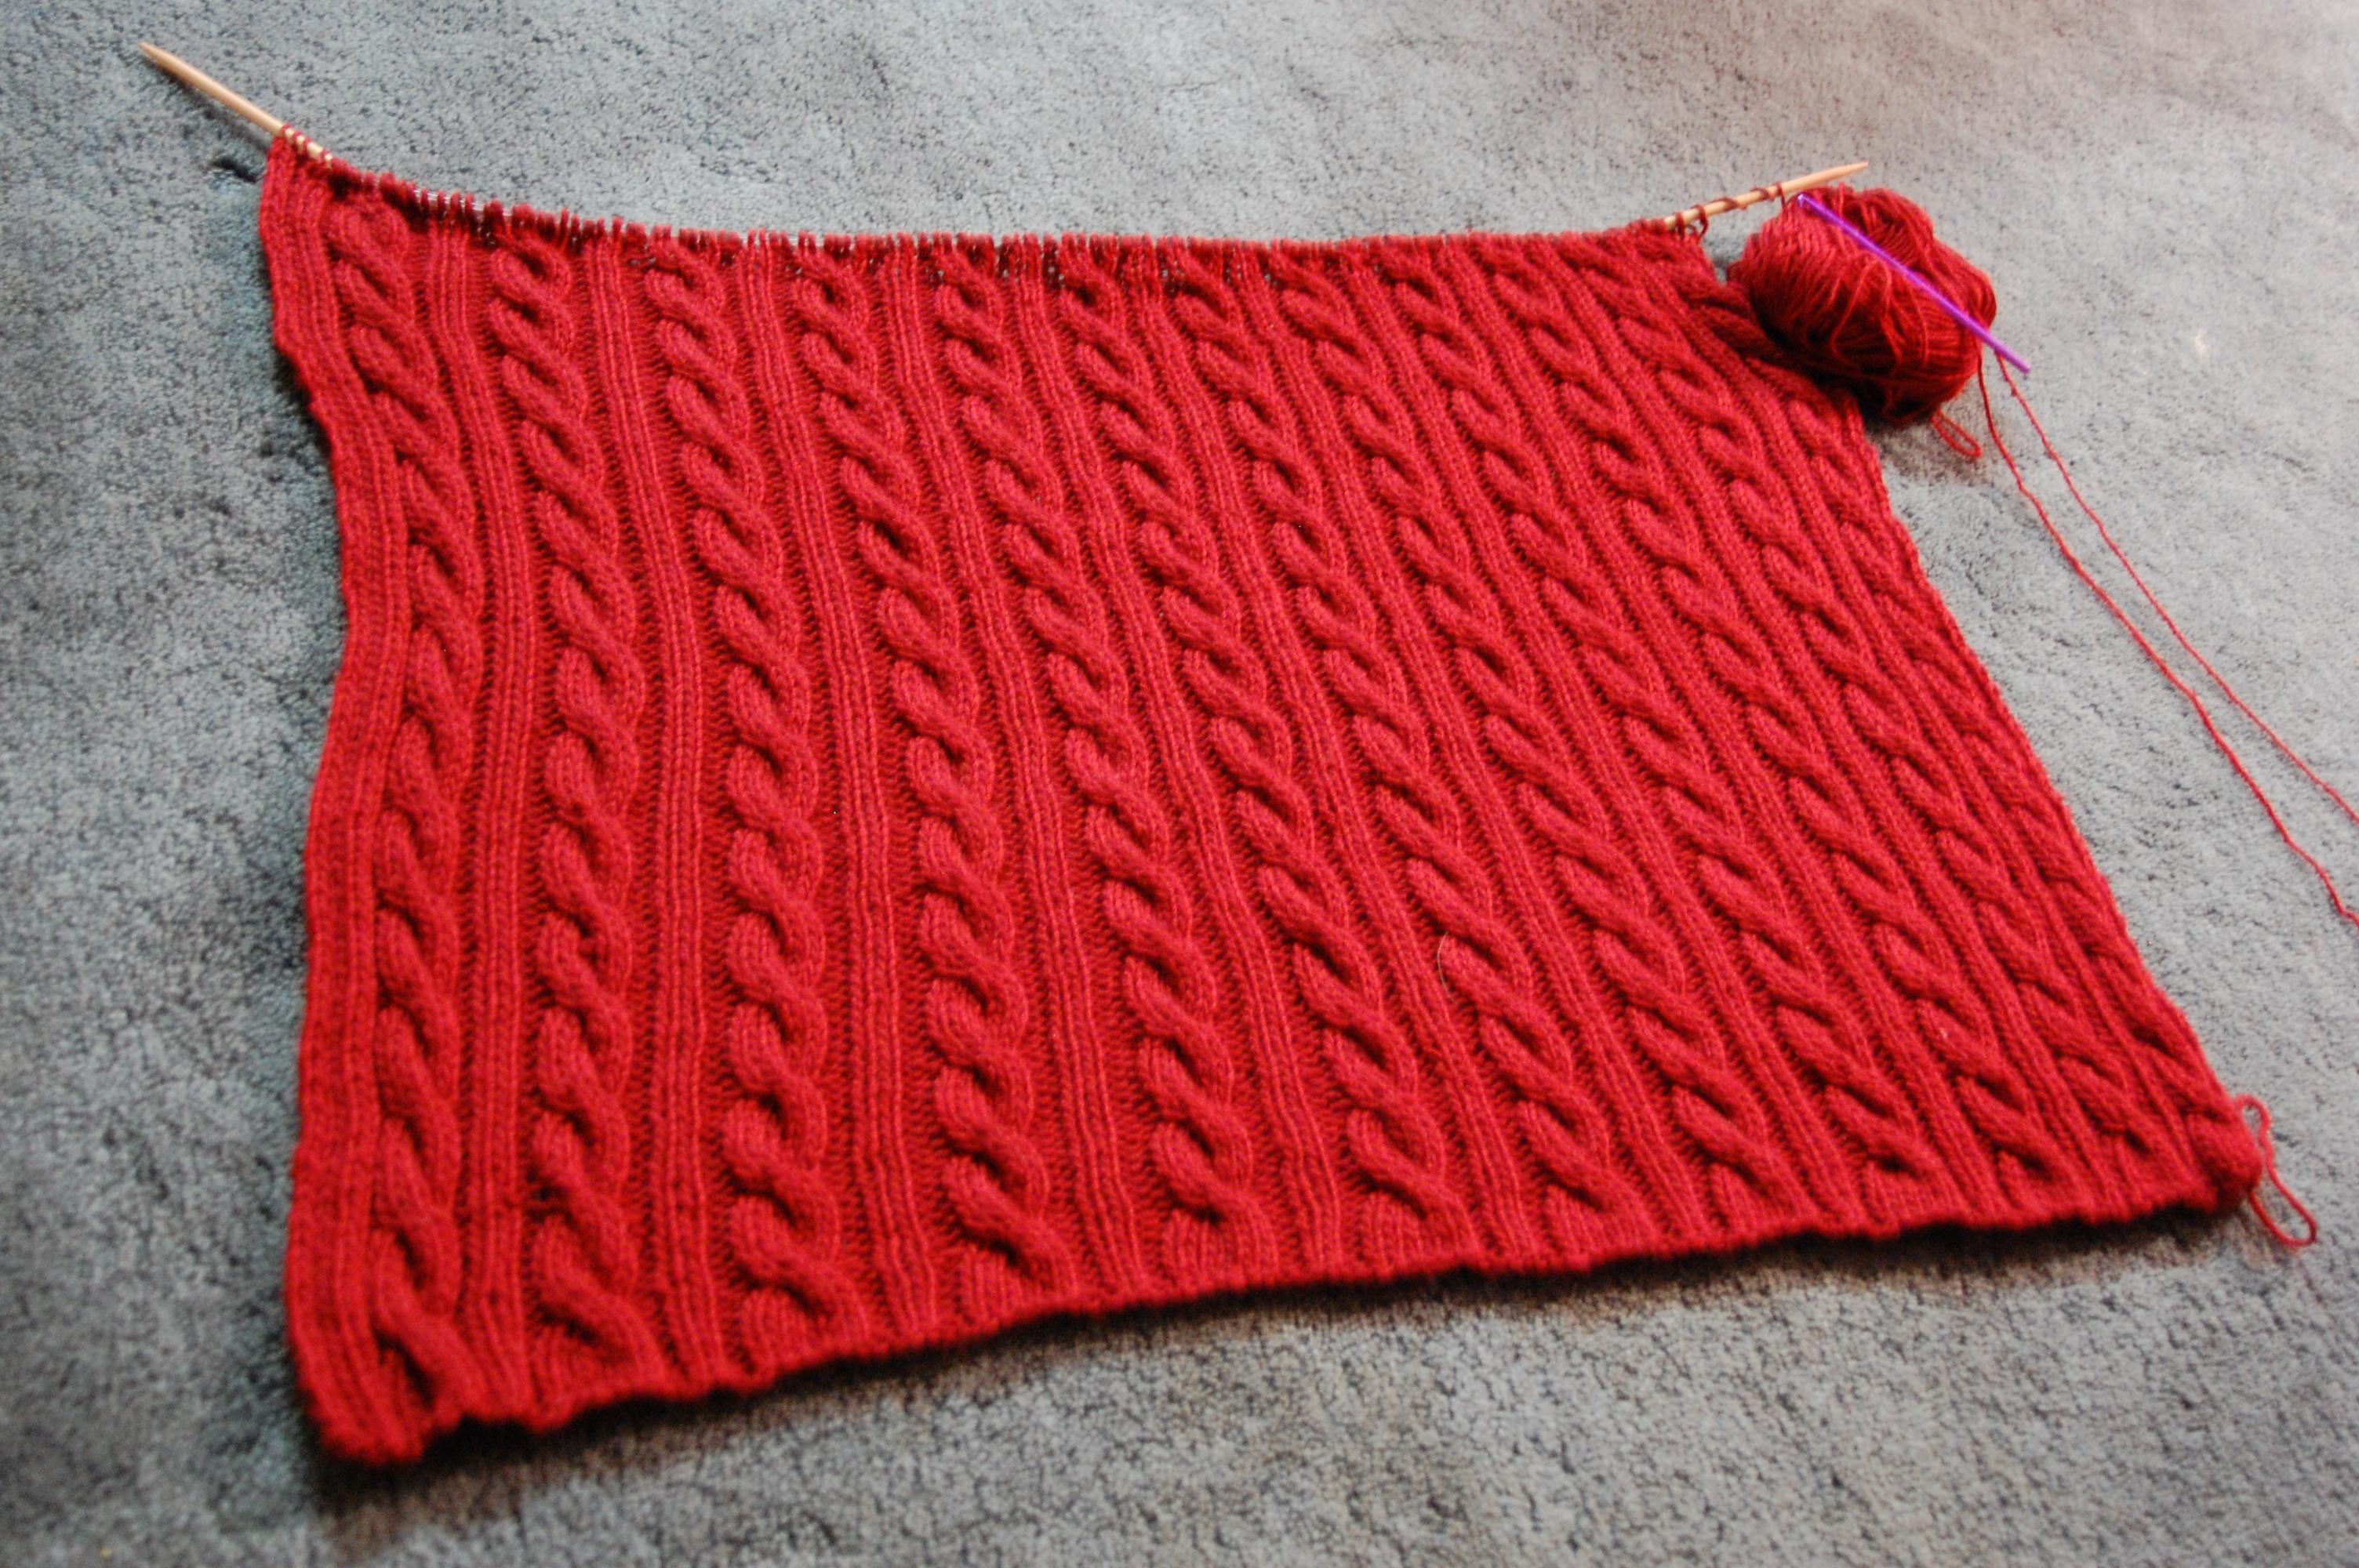 red-blanket-004